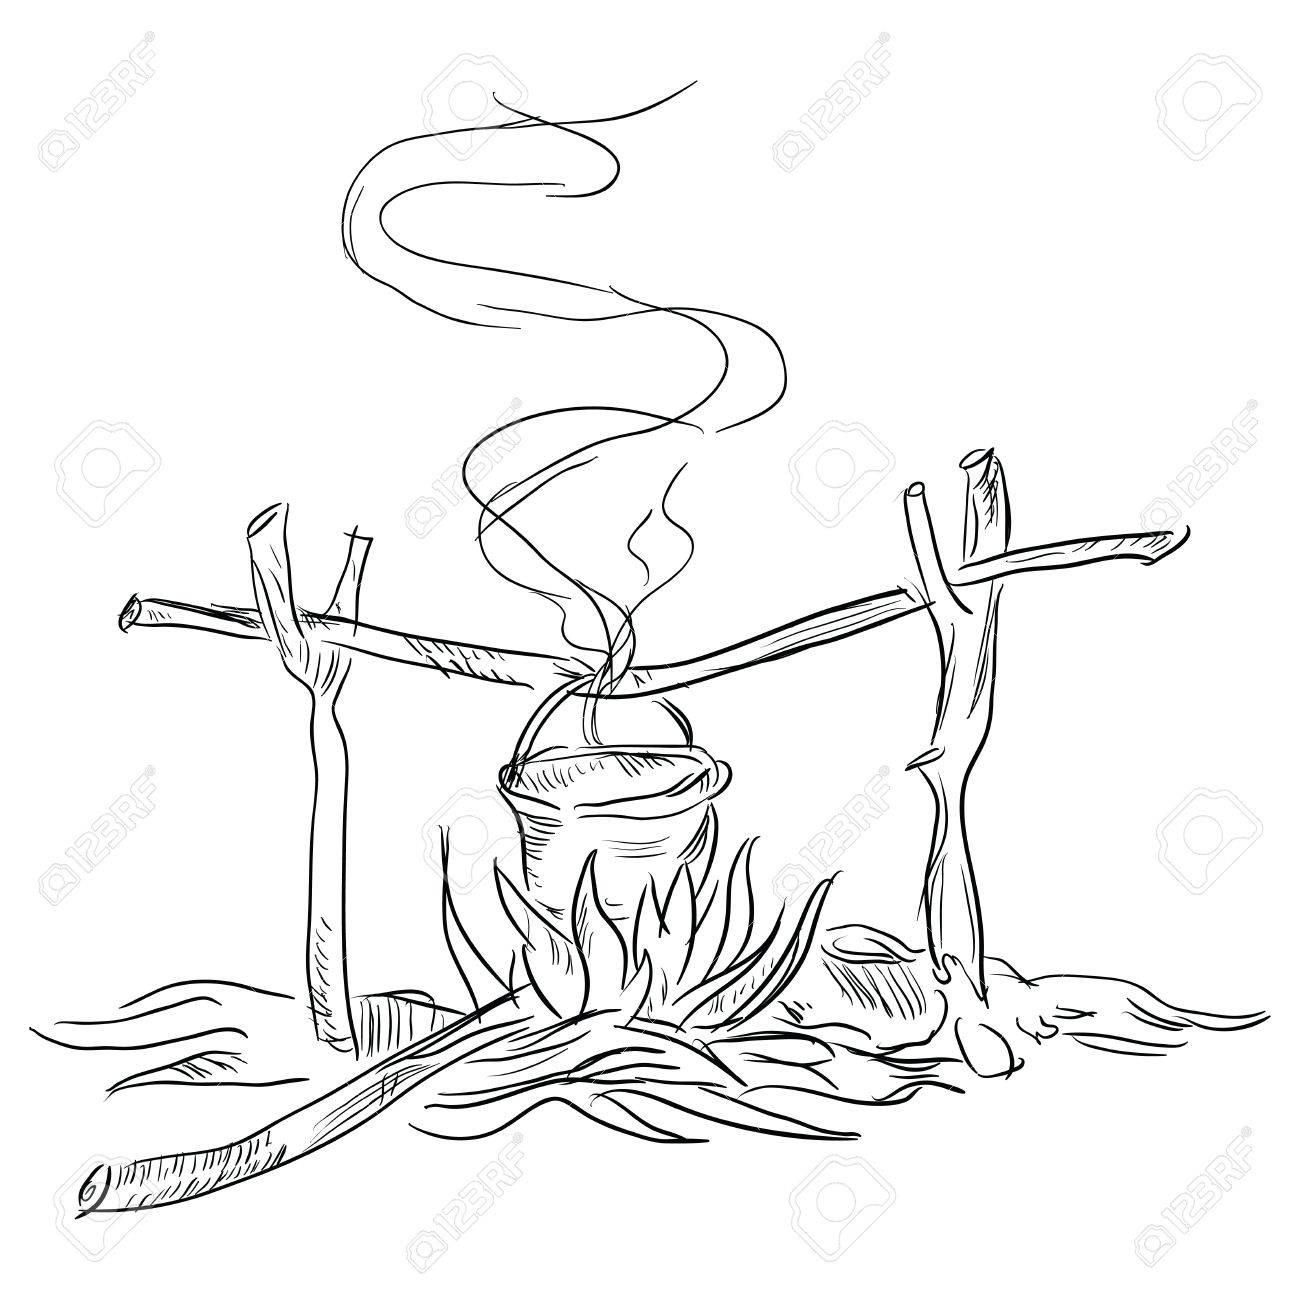 Pot Au Feu De Bois Dessin A La Main Vector Illustration Clip